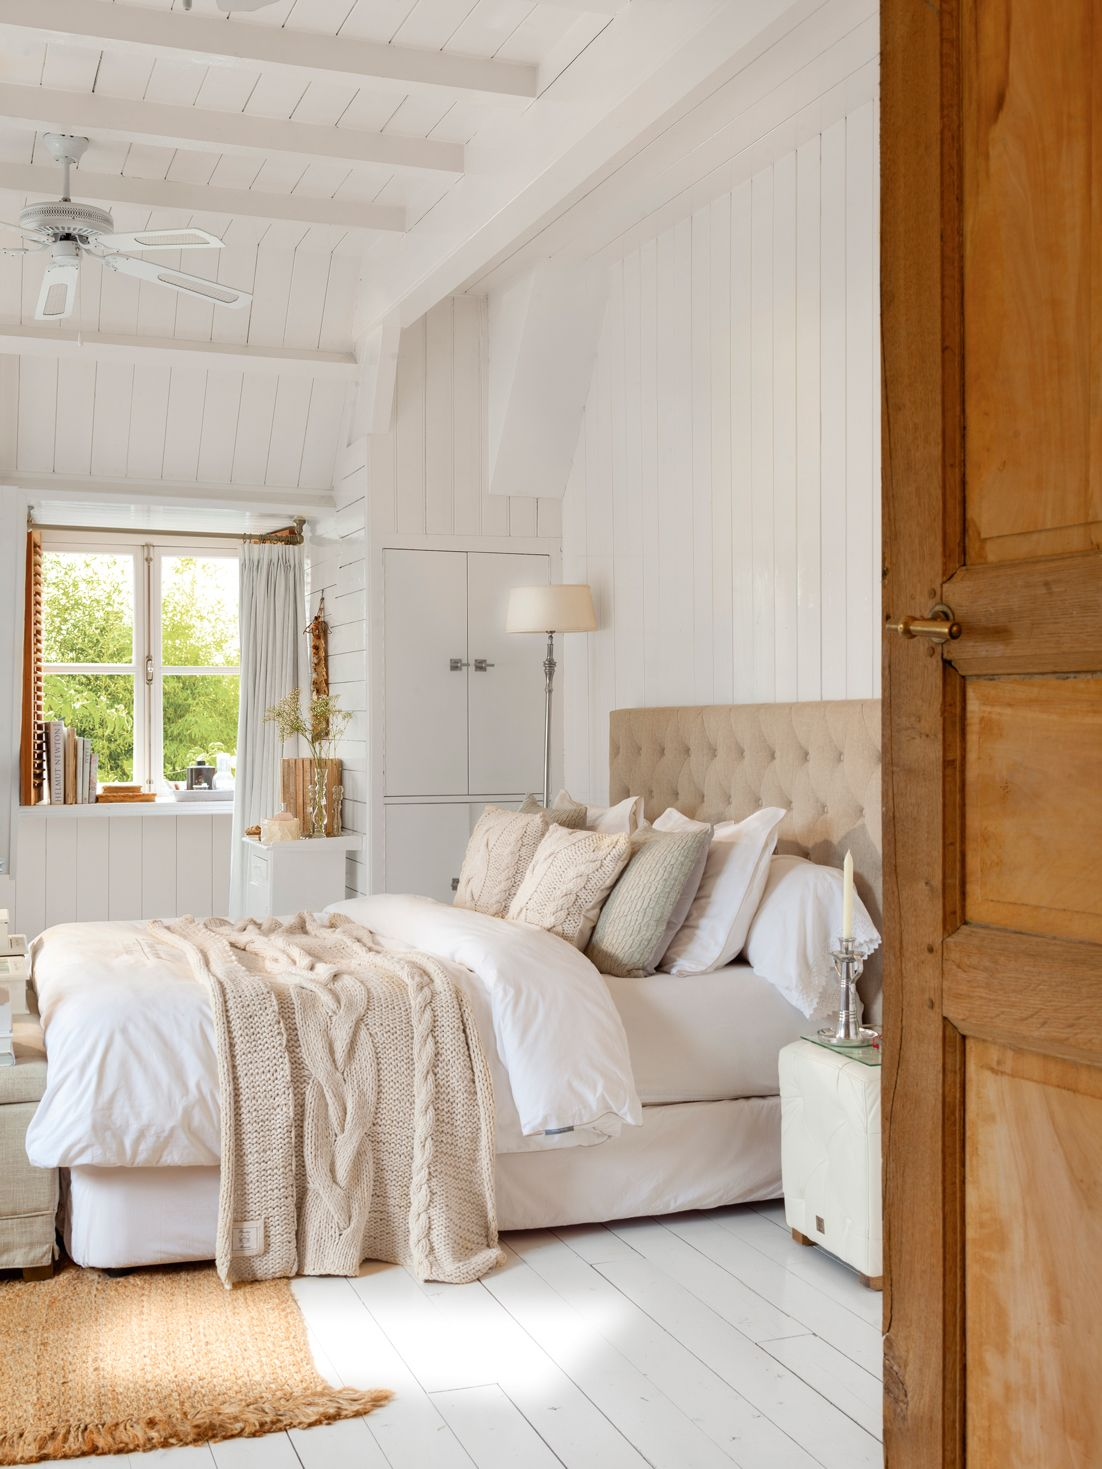 Dormitorio Con Cabecero Tapizado Ropa De Cama De Lana Madera - Tapizar-un-cabecero